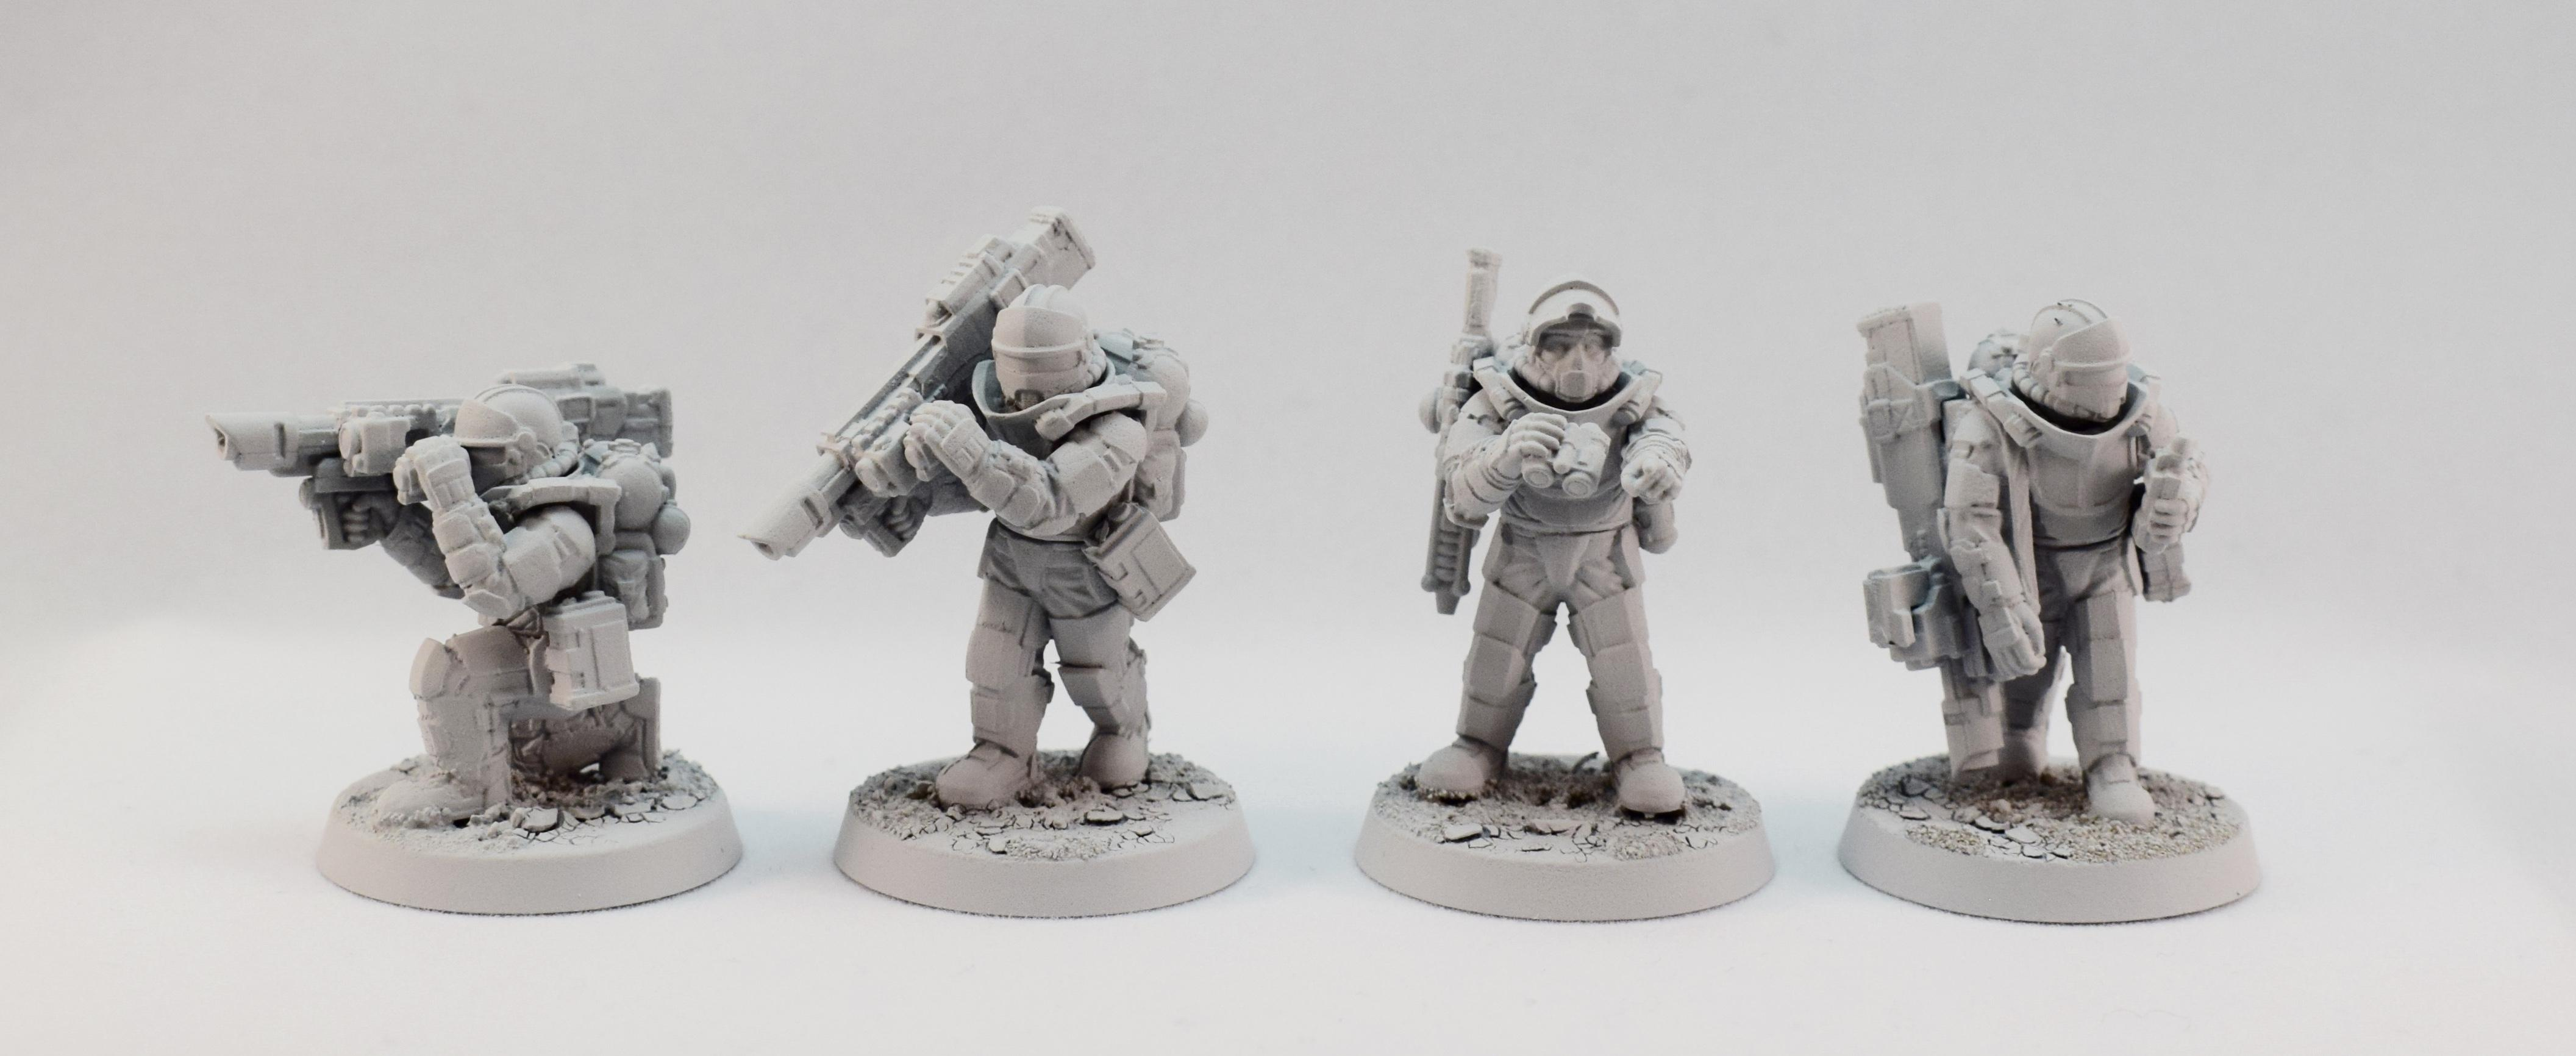 Heavy Weapon Team, Martian Orbital Fusiliers, Regiments